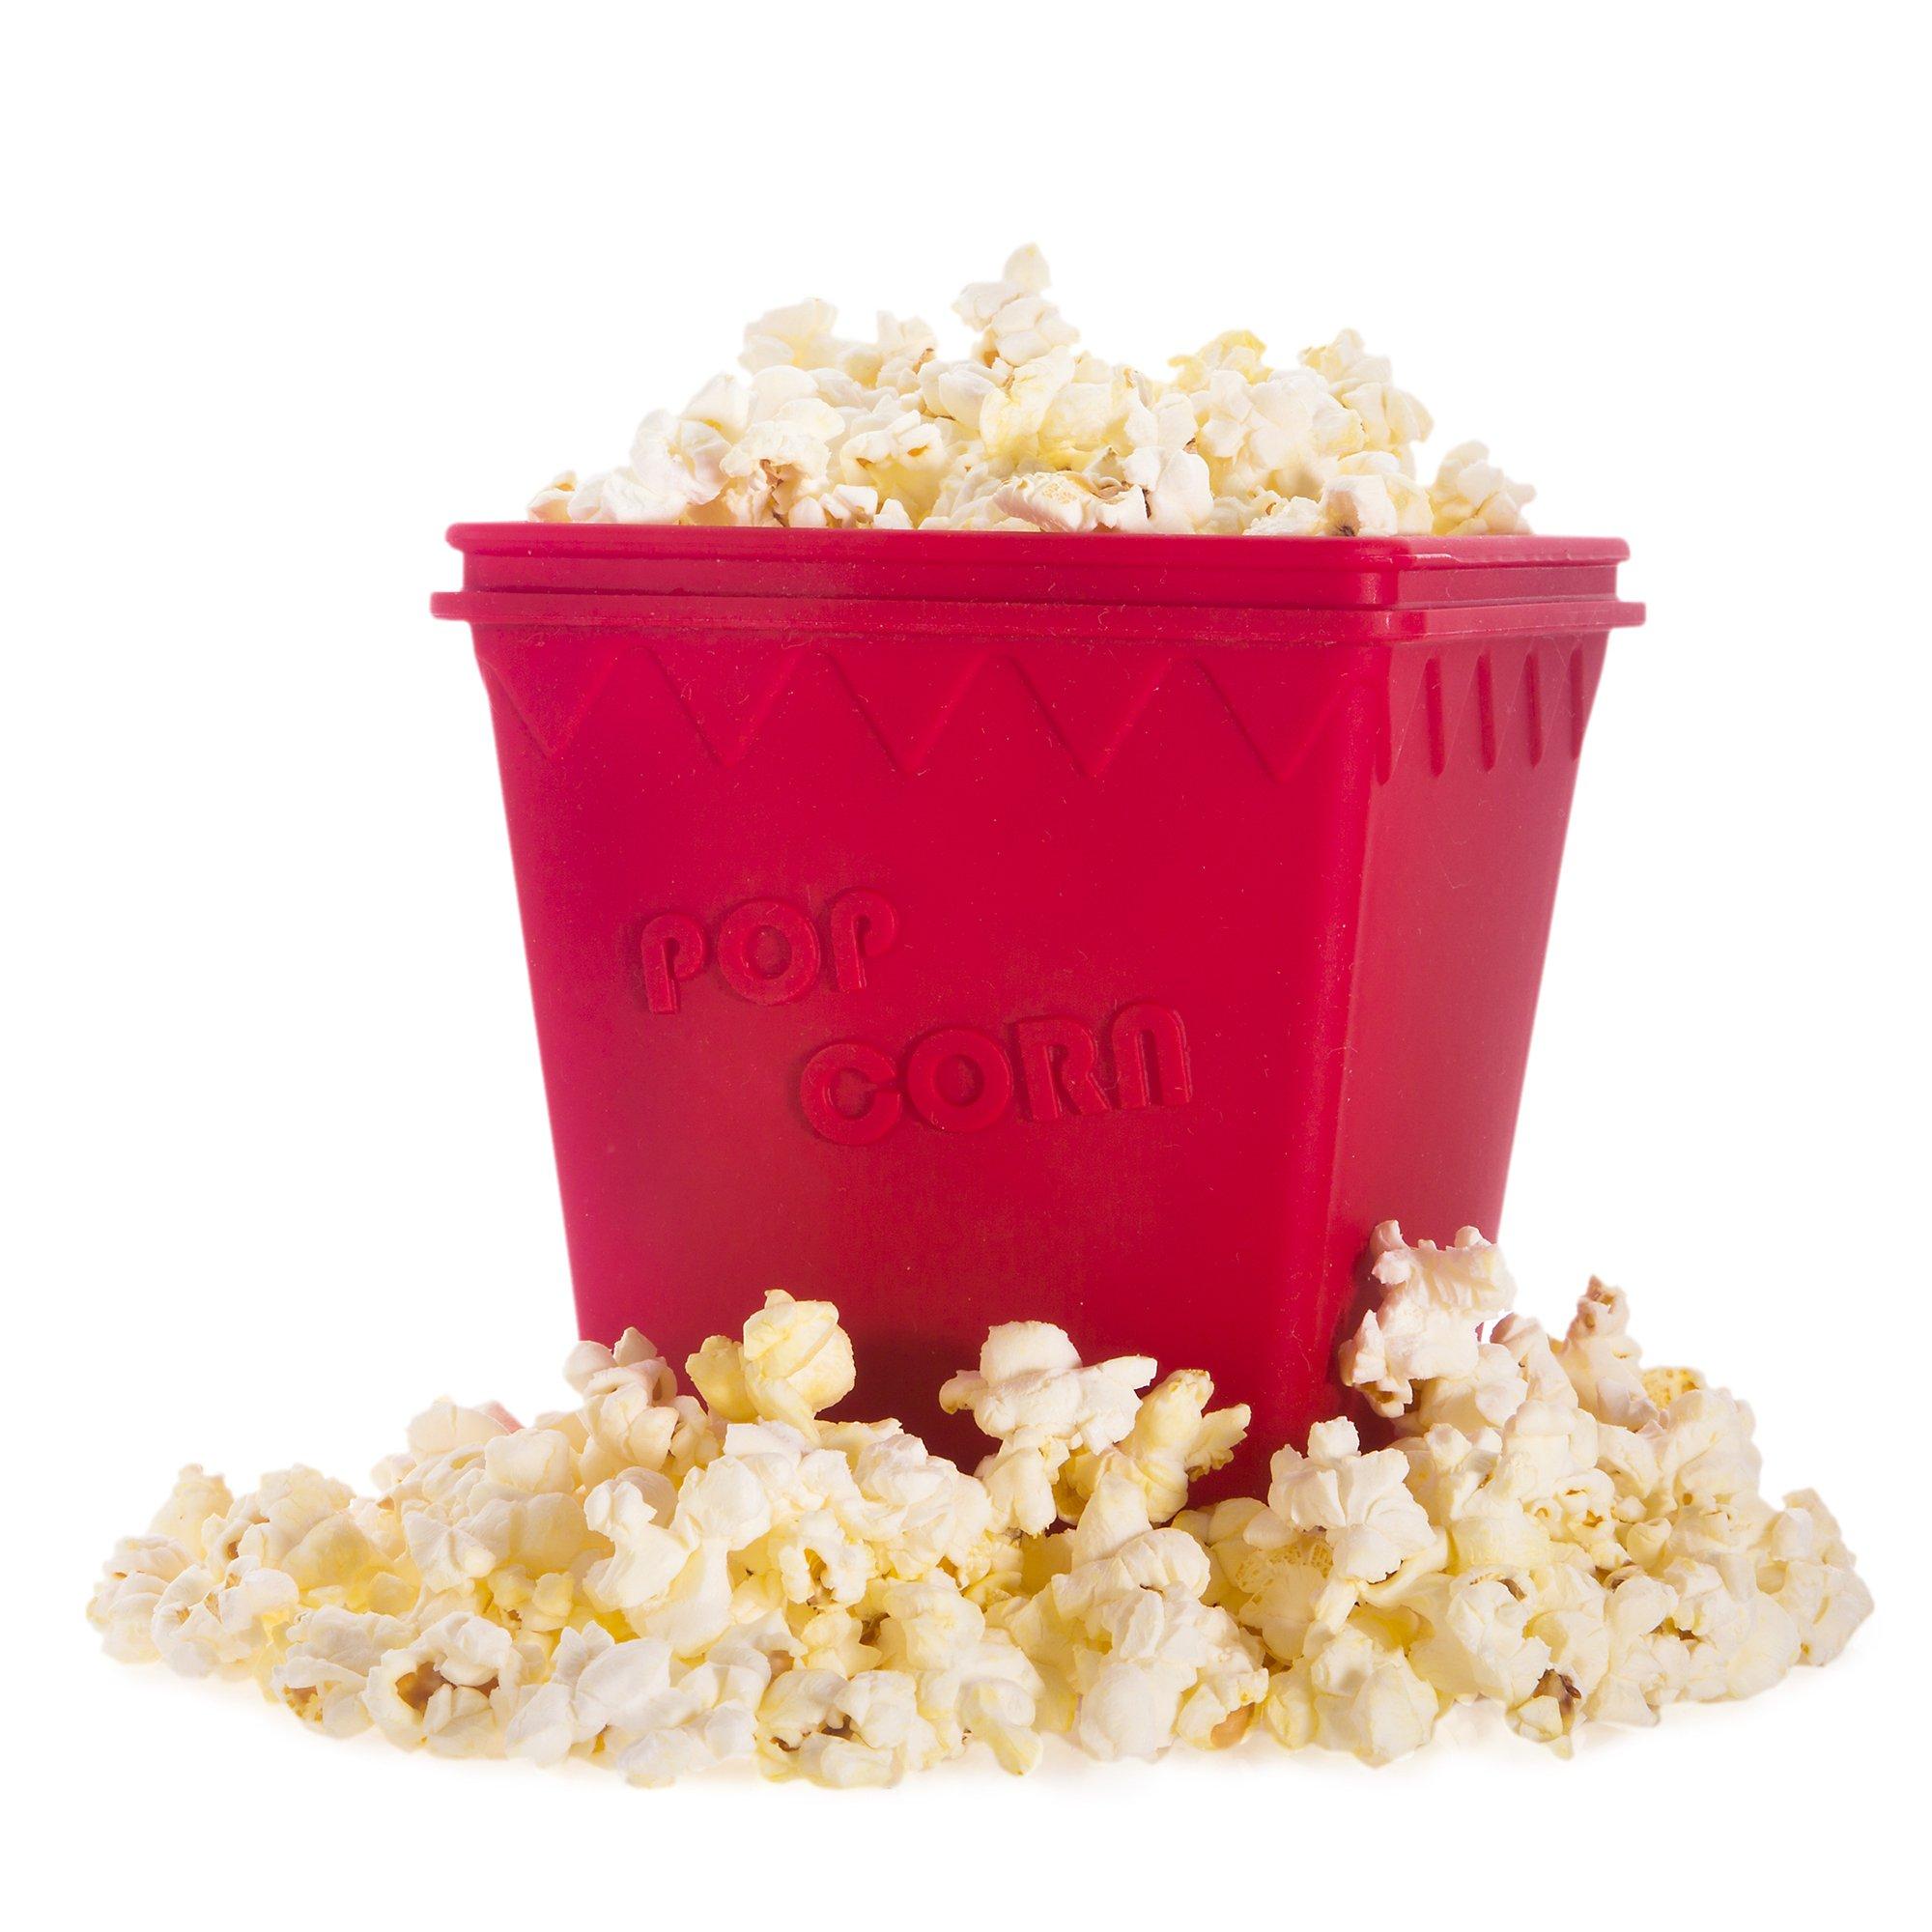 Journey's Edge Cinema-Style Healthy Microwave Popcorn Popper, Red